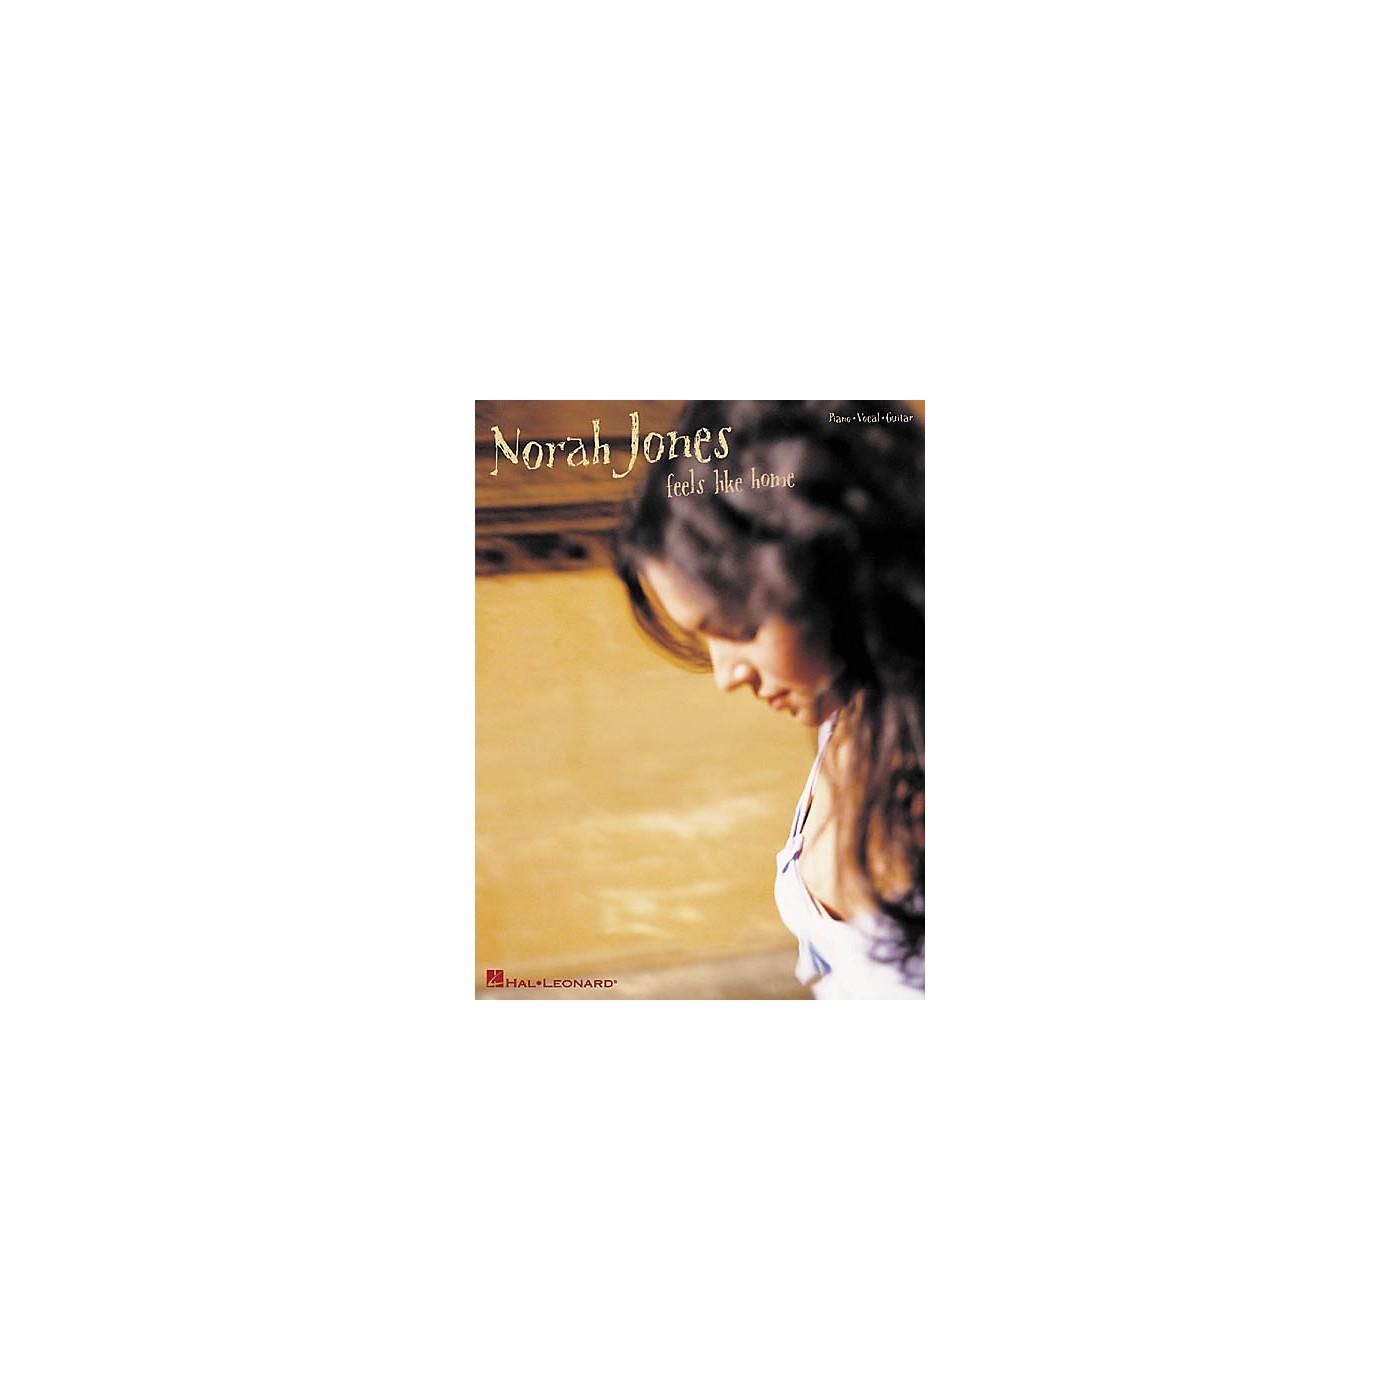 Hal Leonard Norah Jones - Feels Like Home Piano/Vocal/Guitar Artist Songbook thumbnail